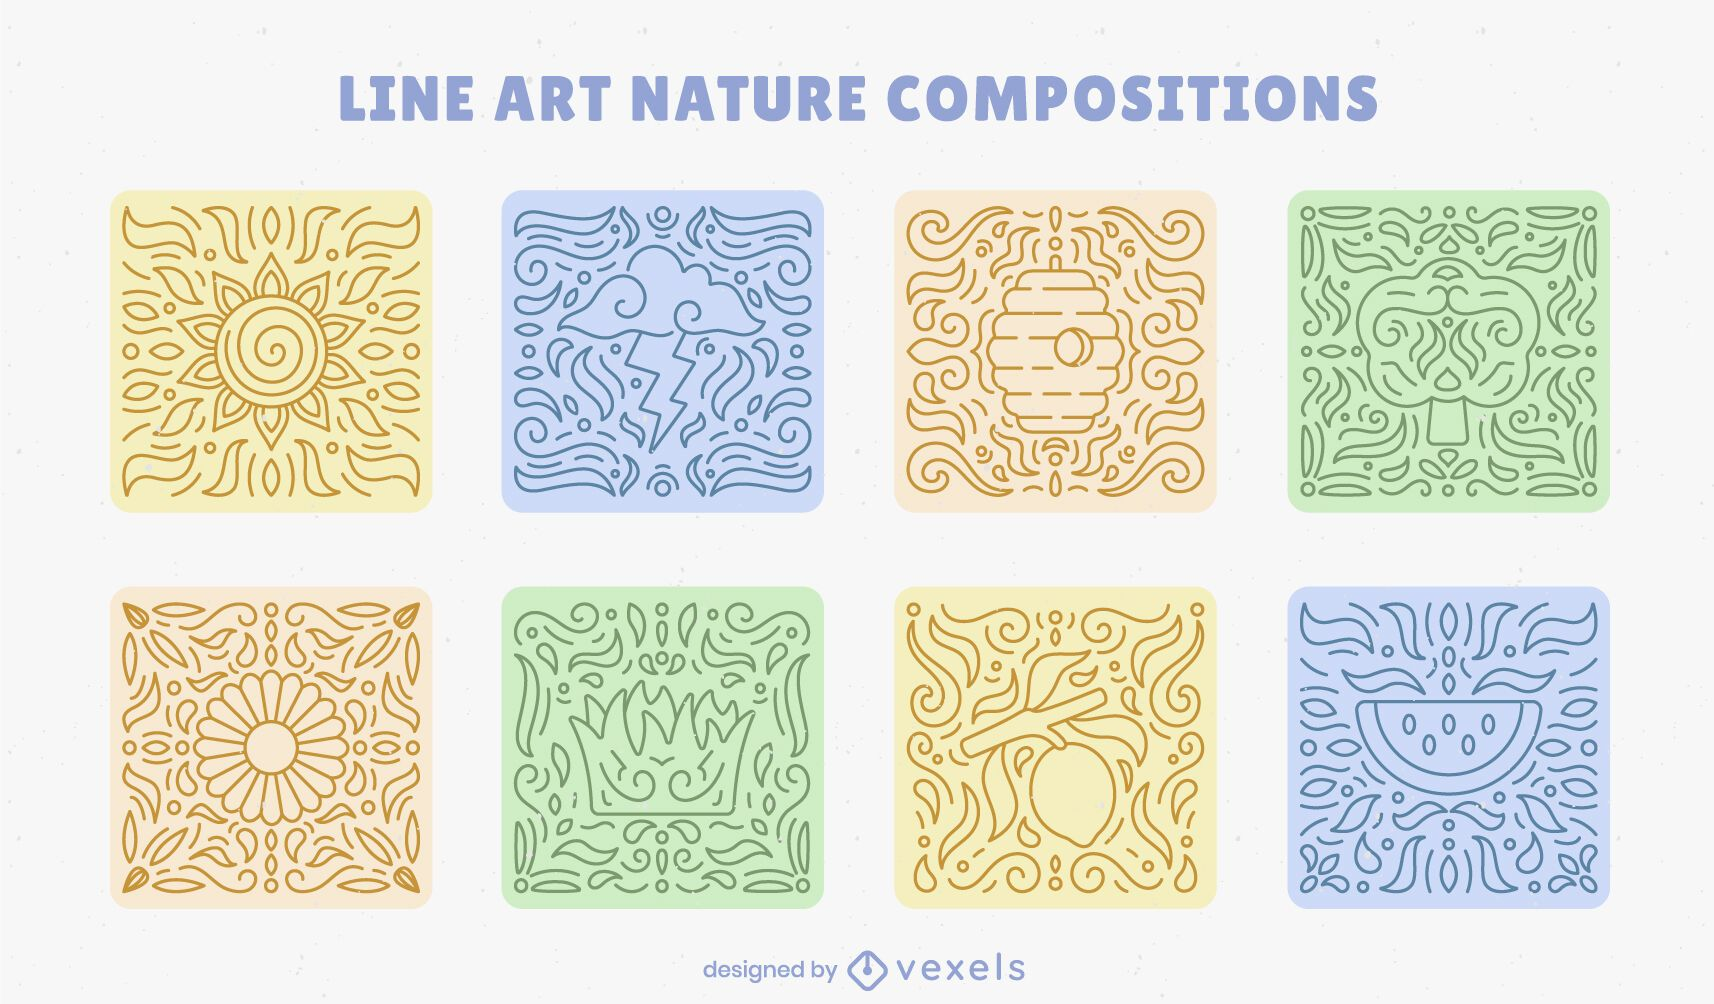 Naturmosaik-Linienkunstkompositionssatz